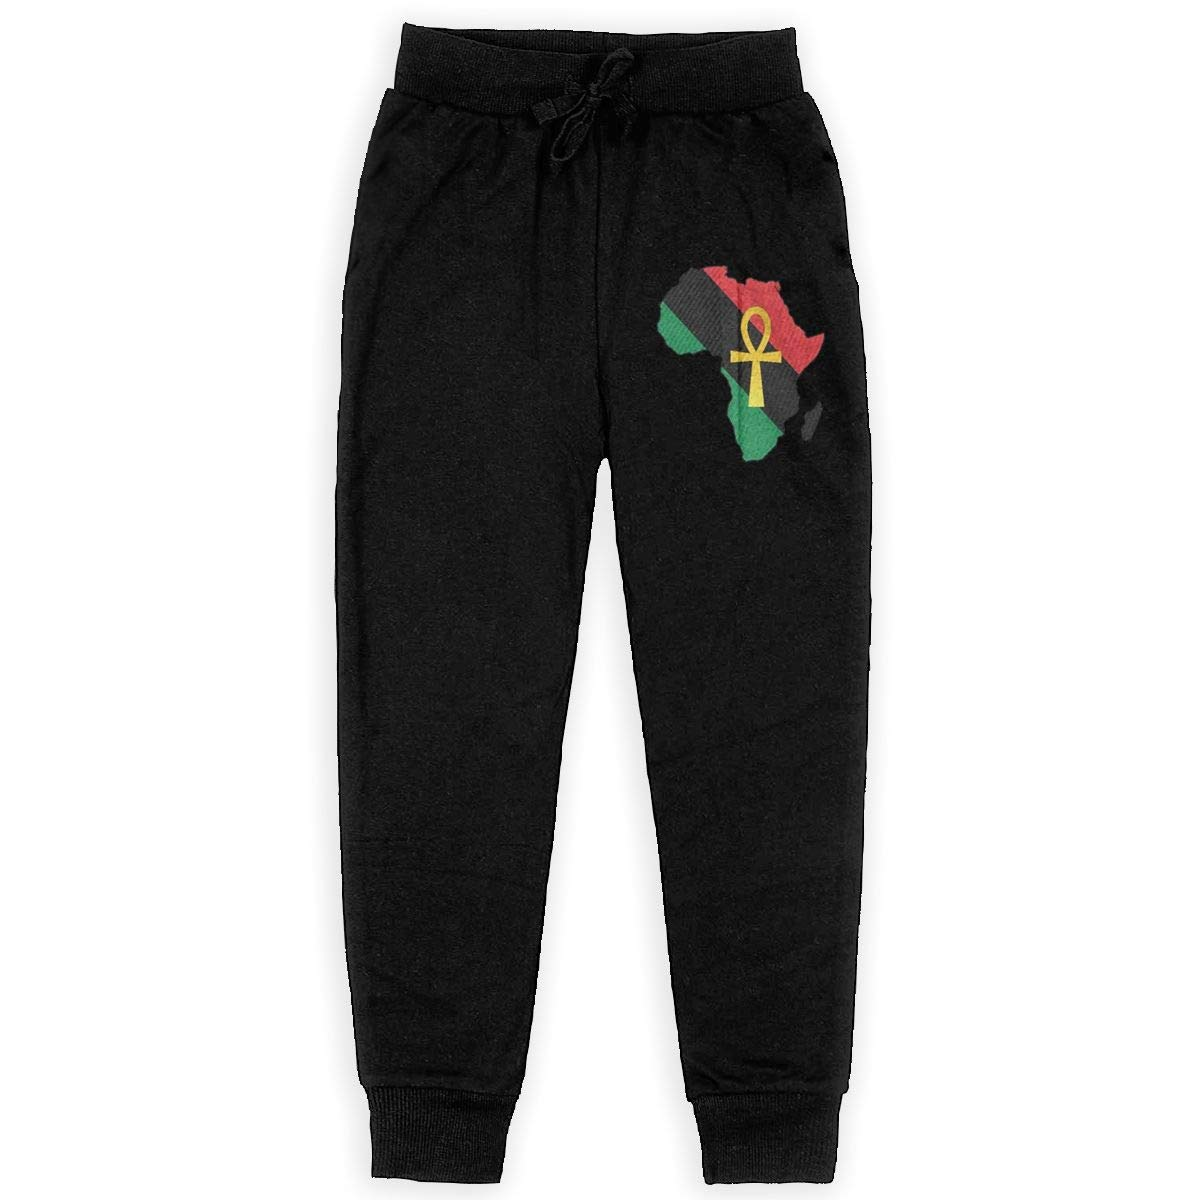 Kim Mittelstaedt Colored Africa Boys Big Active Basic Casual Pants Sweatpants for Boys Black